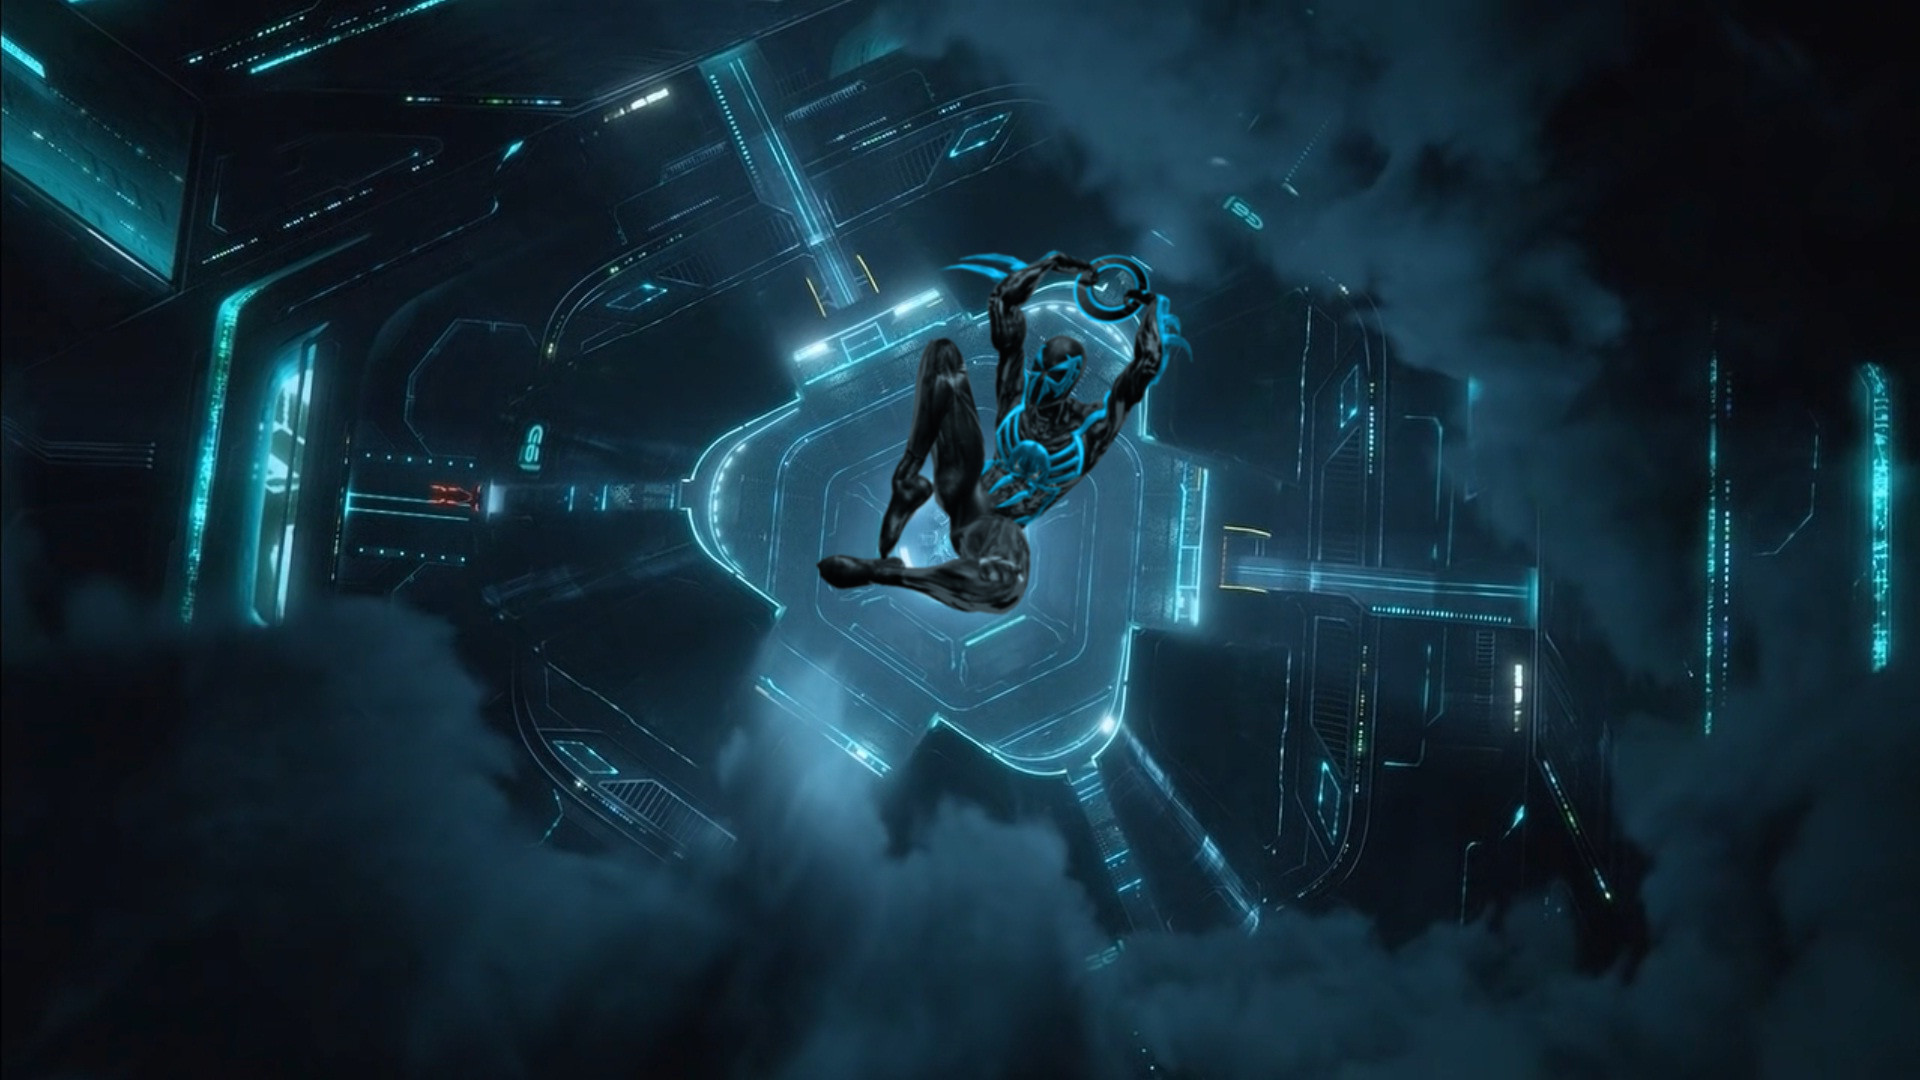 Tron Legacy Spider-Man 2099 by saltso on DeviantArt